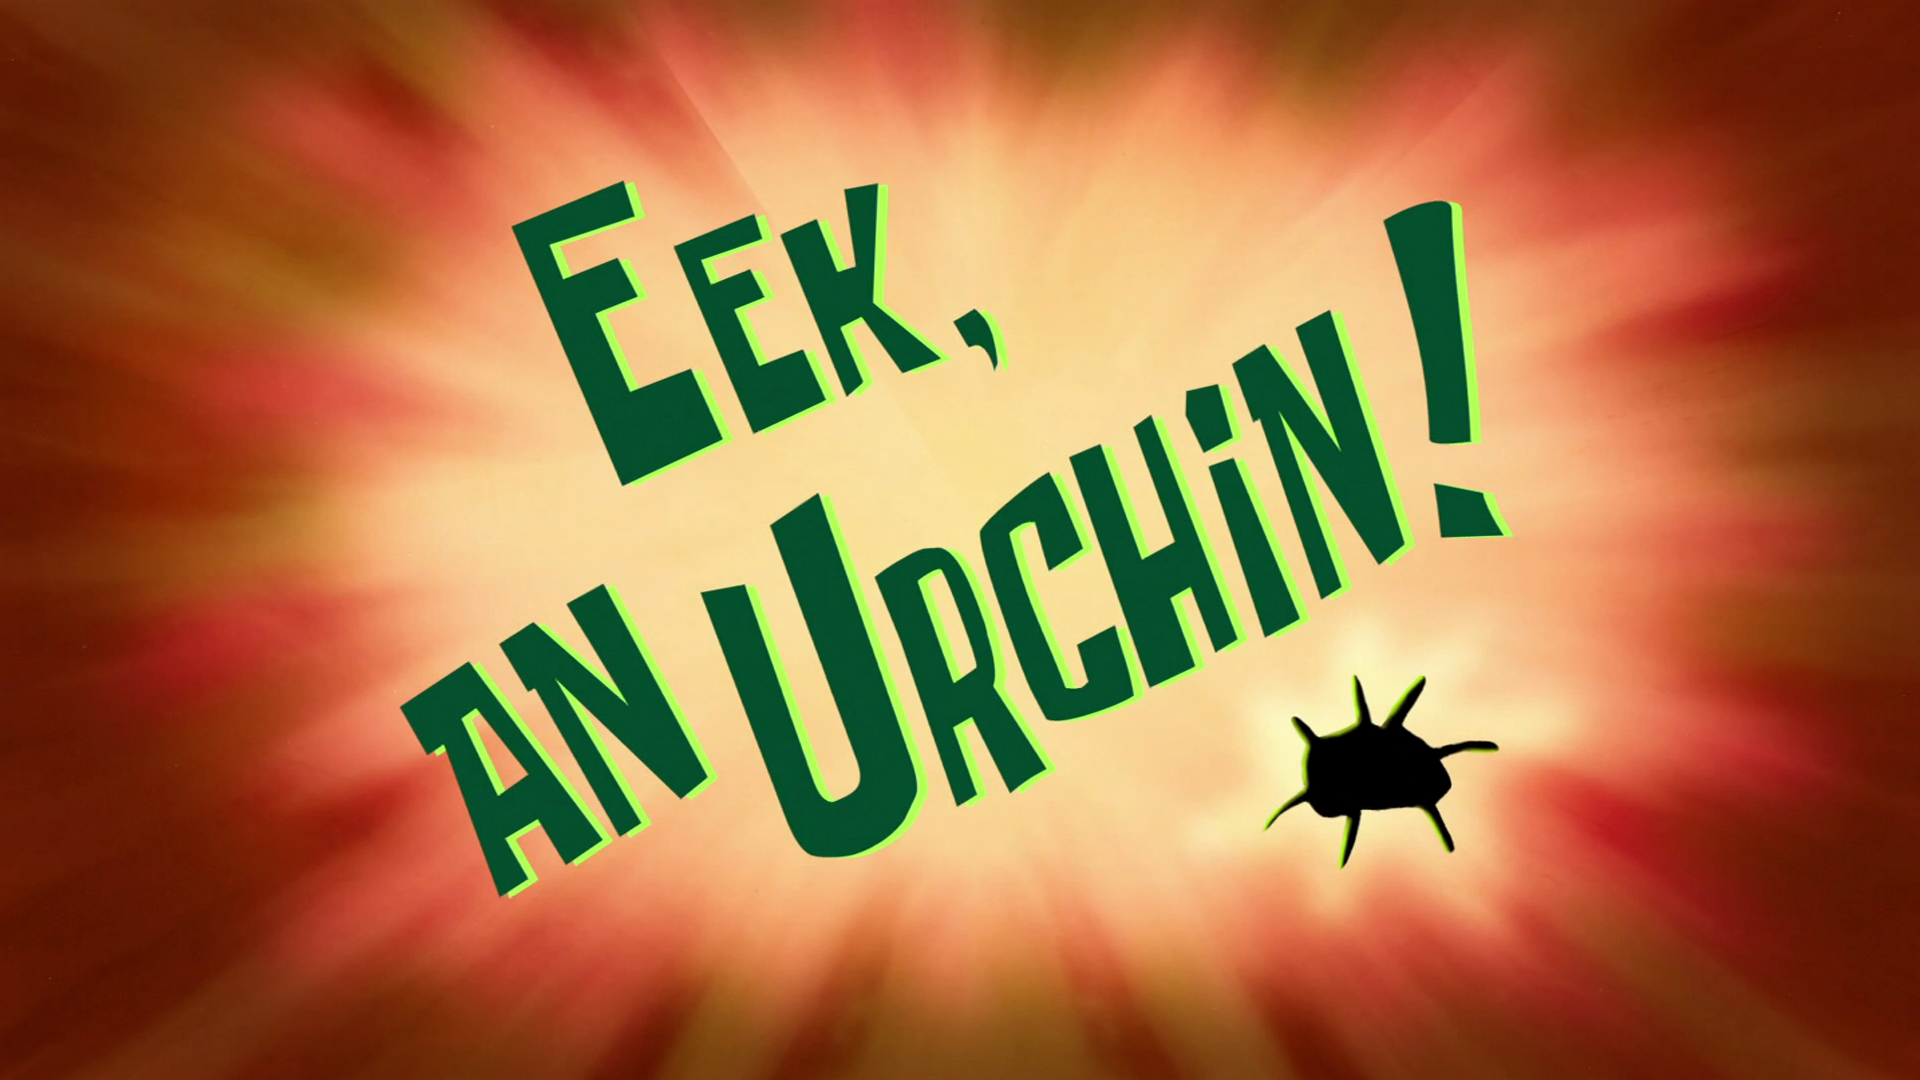 spongebob squarepants season 9 nickelodeon fandom powered by wikia